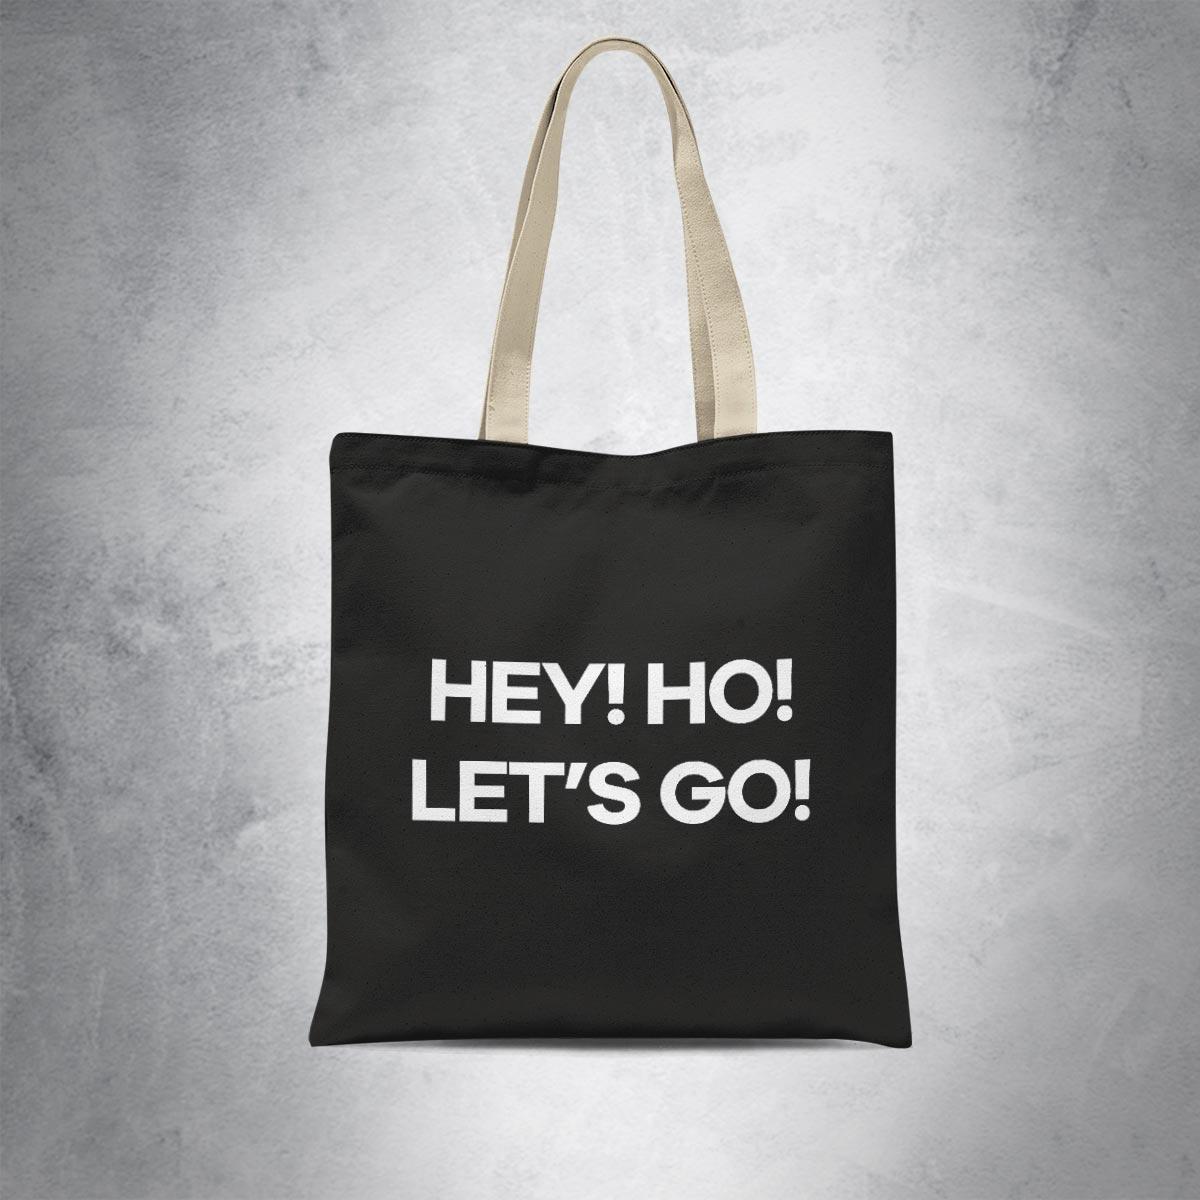 RAMONES - Hey! Ho! Let's Go!